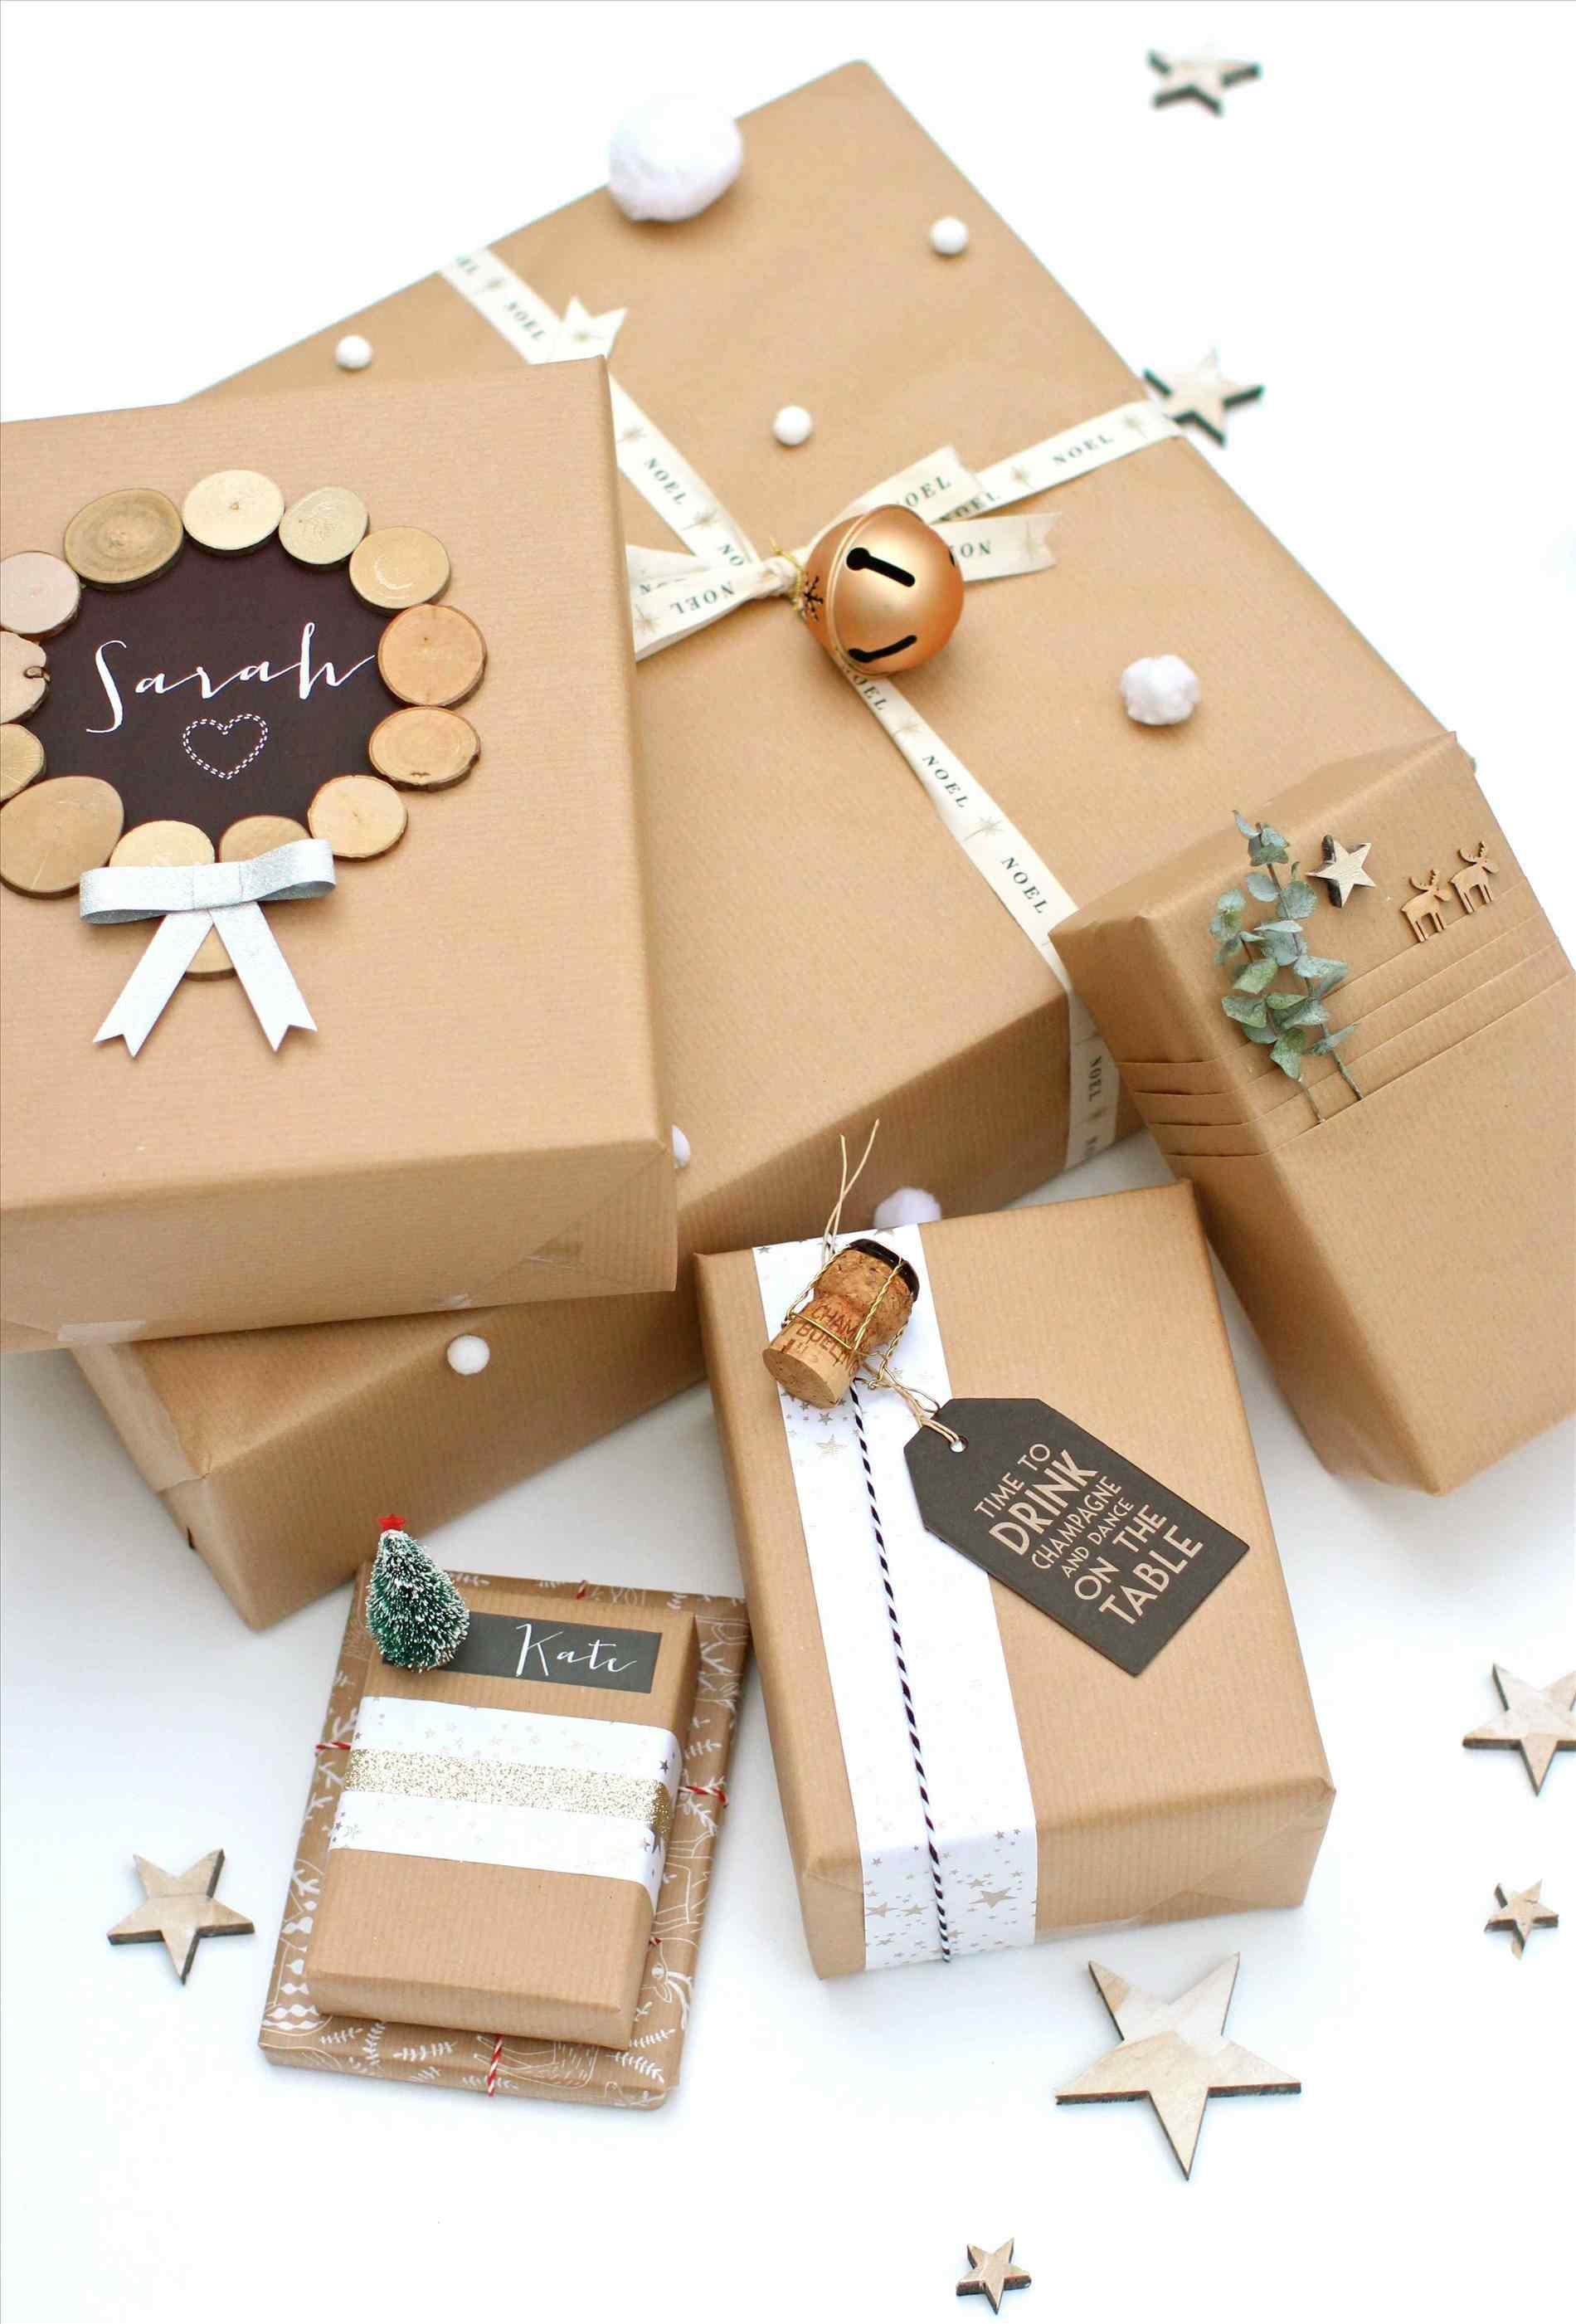 ideas-rhpinterestcom-the-lazy-girlus-guide-to-beautiful-maison-de-paxrhmaisondepaxcom-the-Modern-Gift-Wrapping-Ideas-lazy-girlus-guide-to-beautiful-gift.jpg